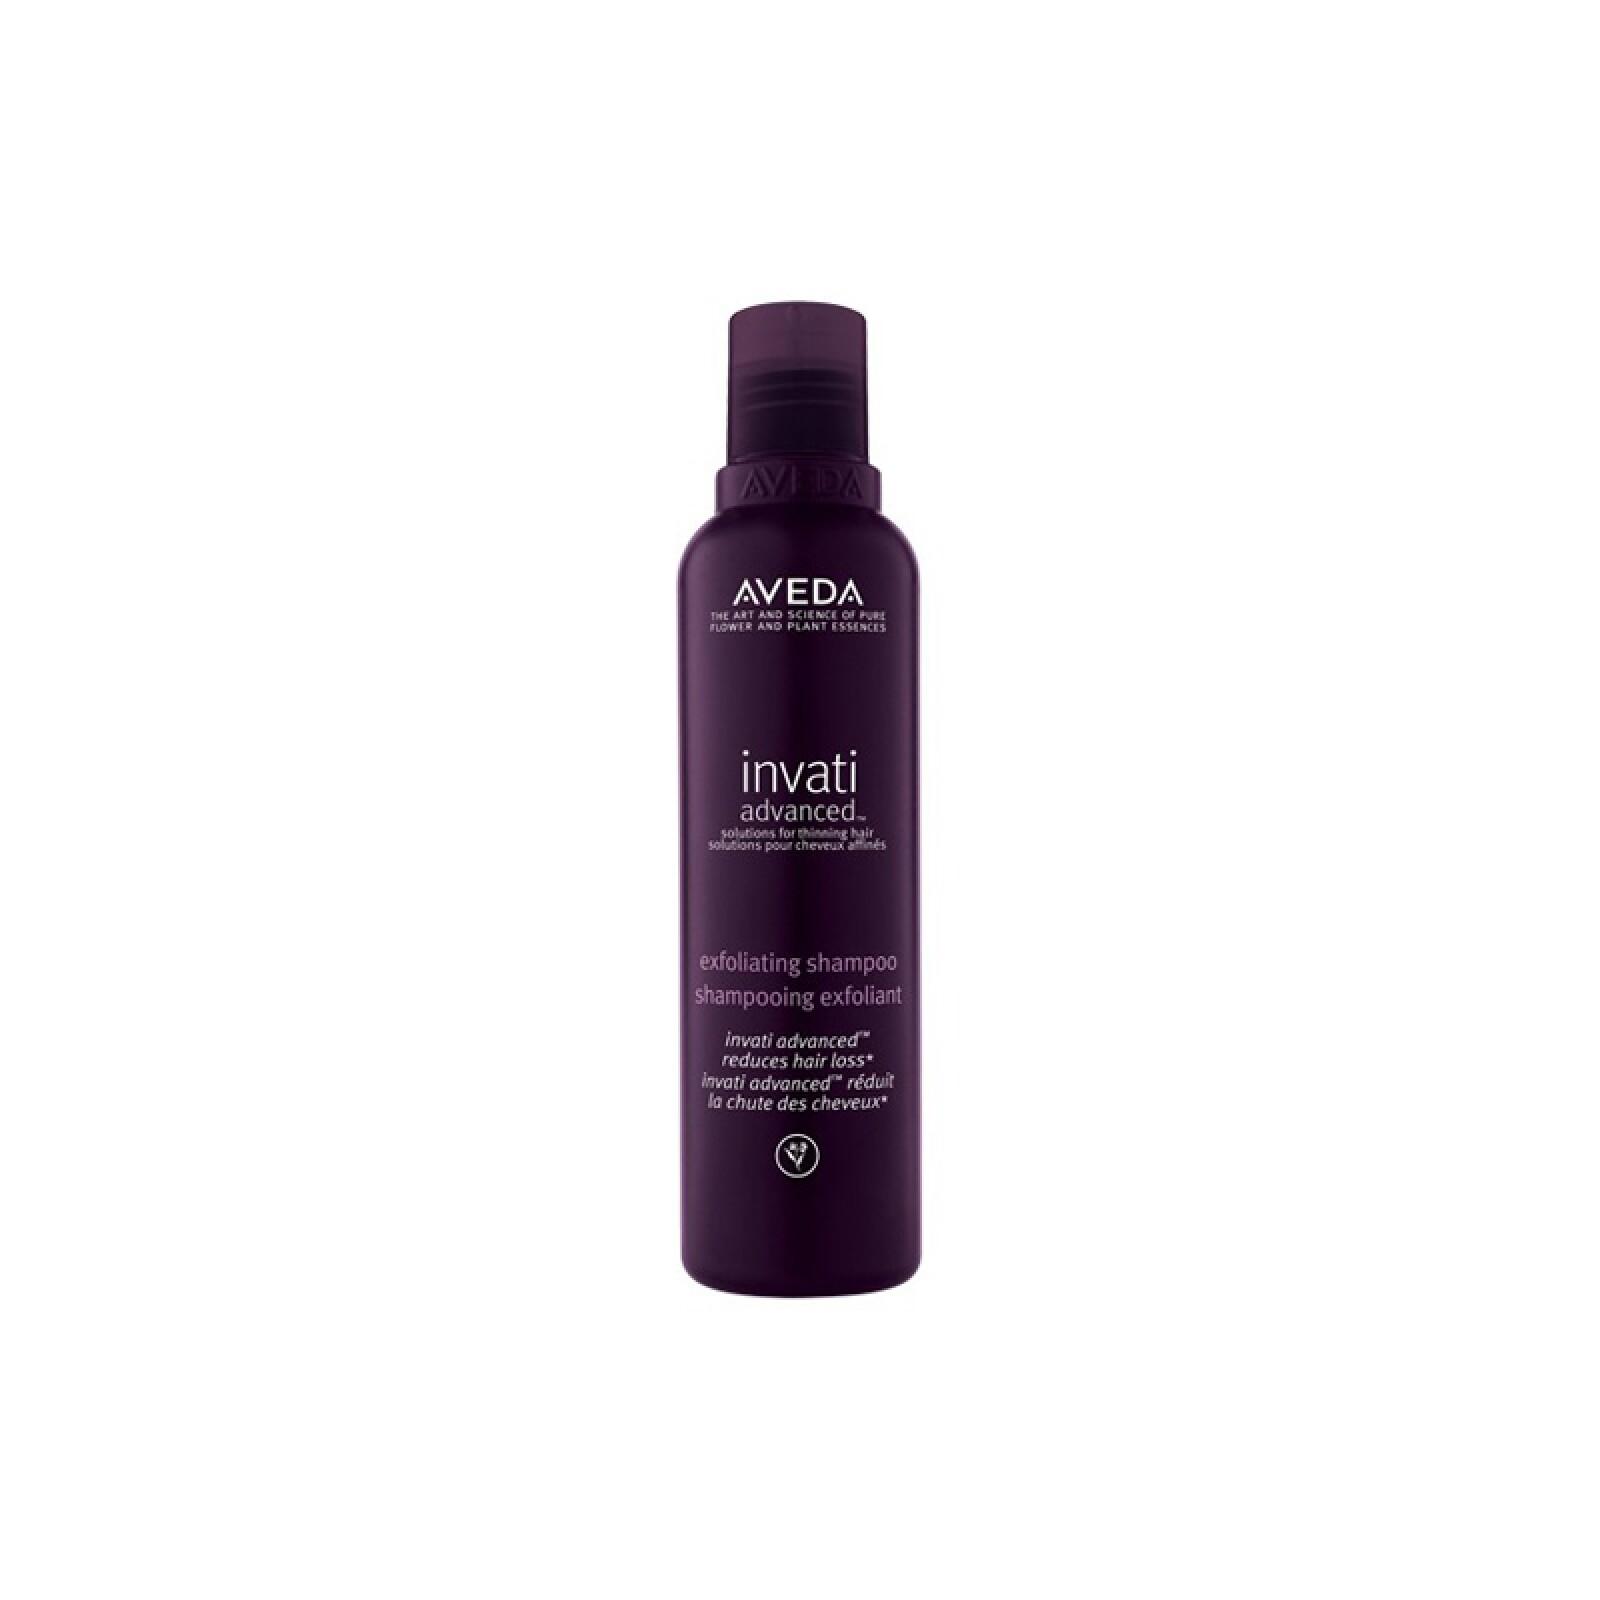 Aveda Invati Advanced Exfoliating Shampoo ($750, sephora.com.mx)